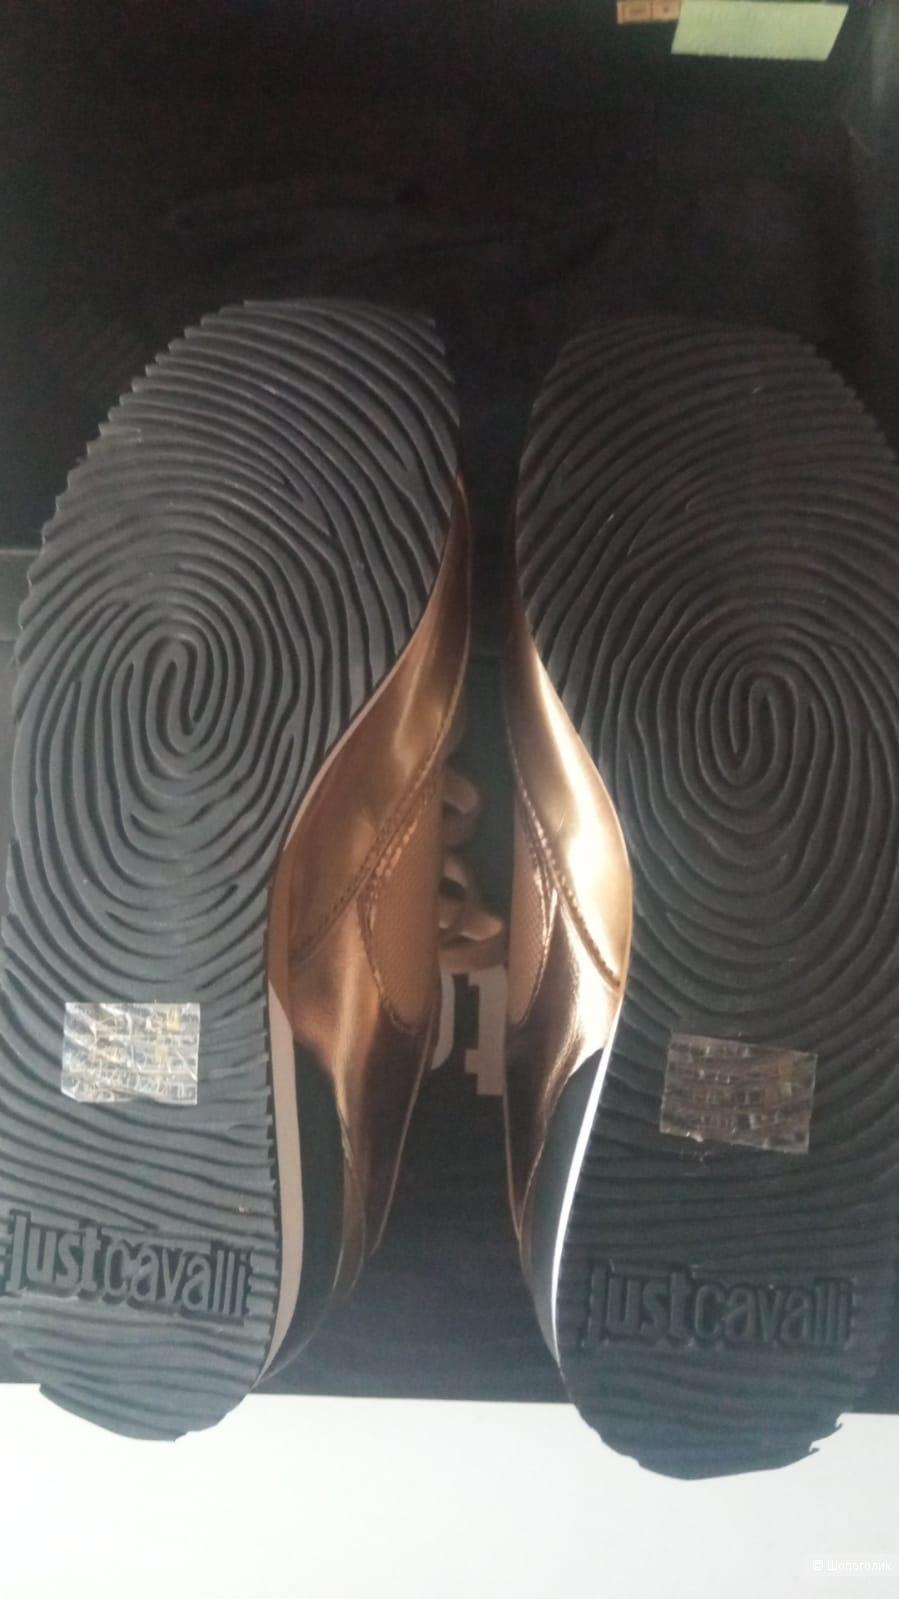 Кроссовки Just Cavalli, размер 37